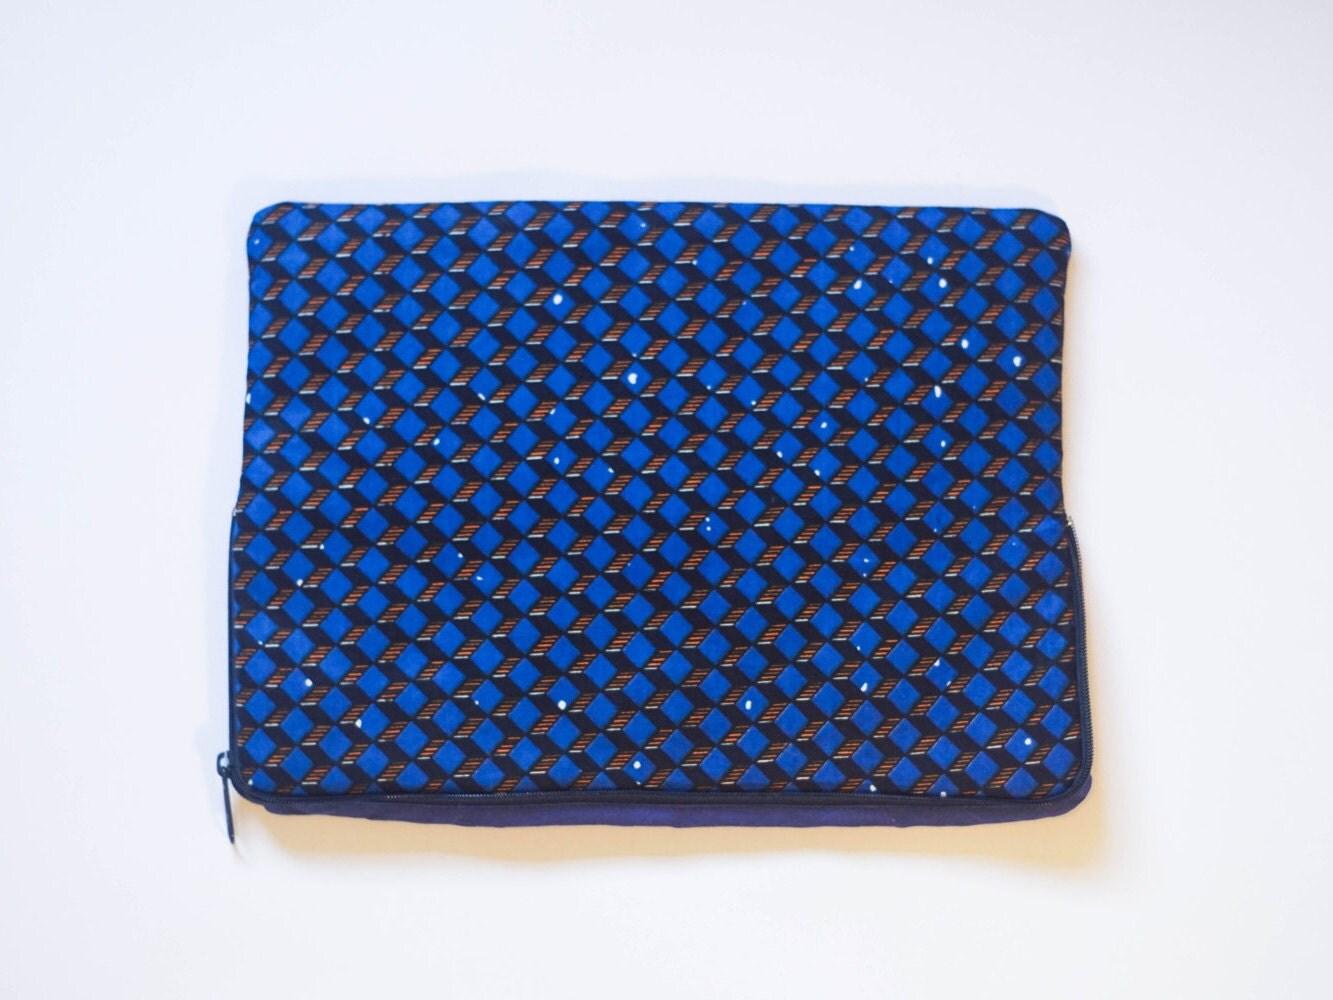 Geometric  Ankara  African Print  MacBook Pro Sleeve  Laptop Sleeve  Laptop Case  Laptop Bag